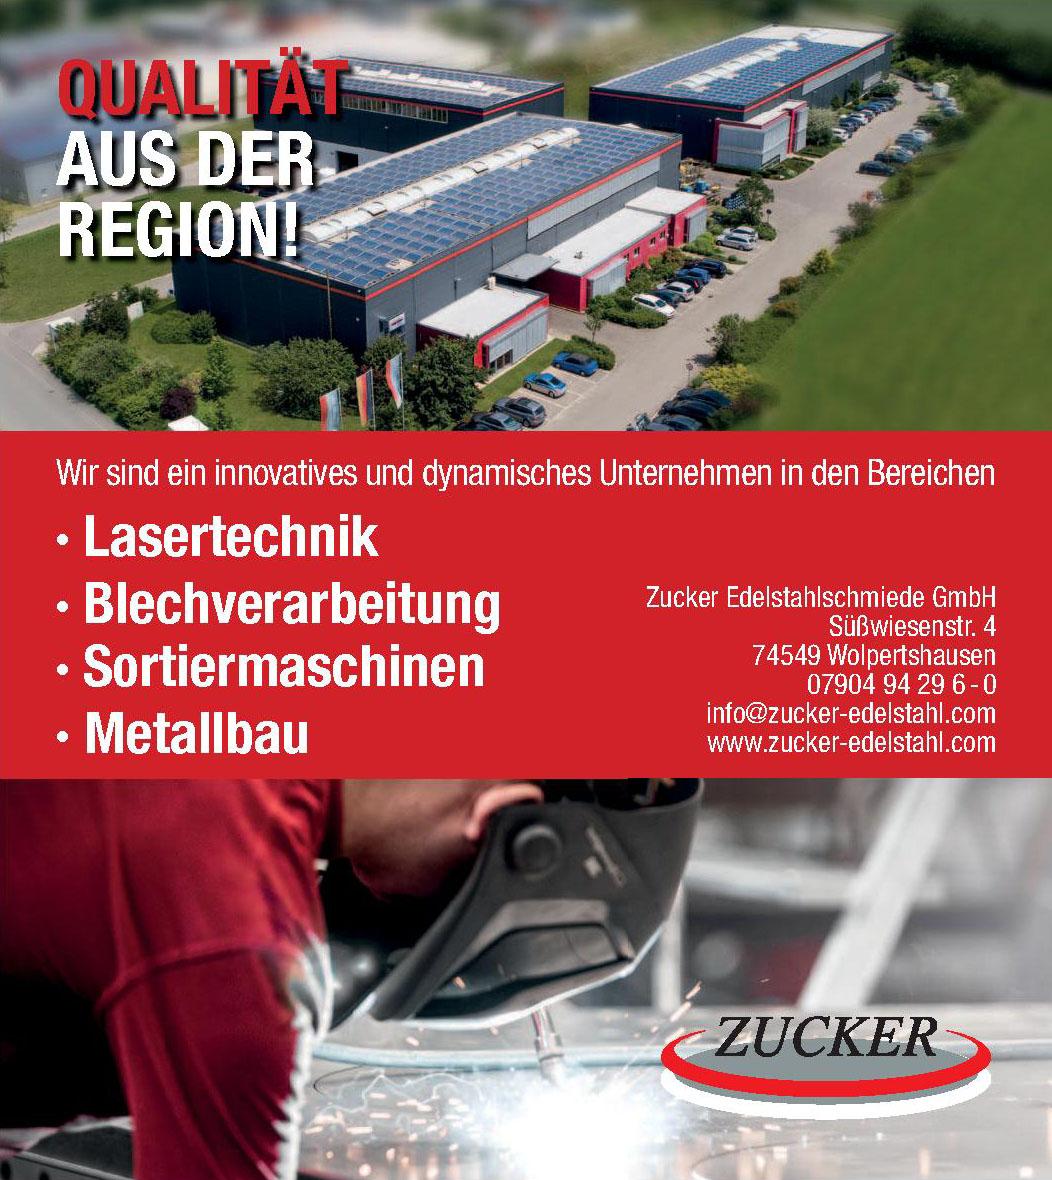 Zucker Edelstahlschmiede GmbH